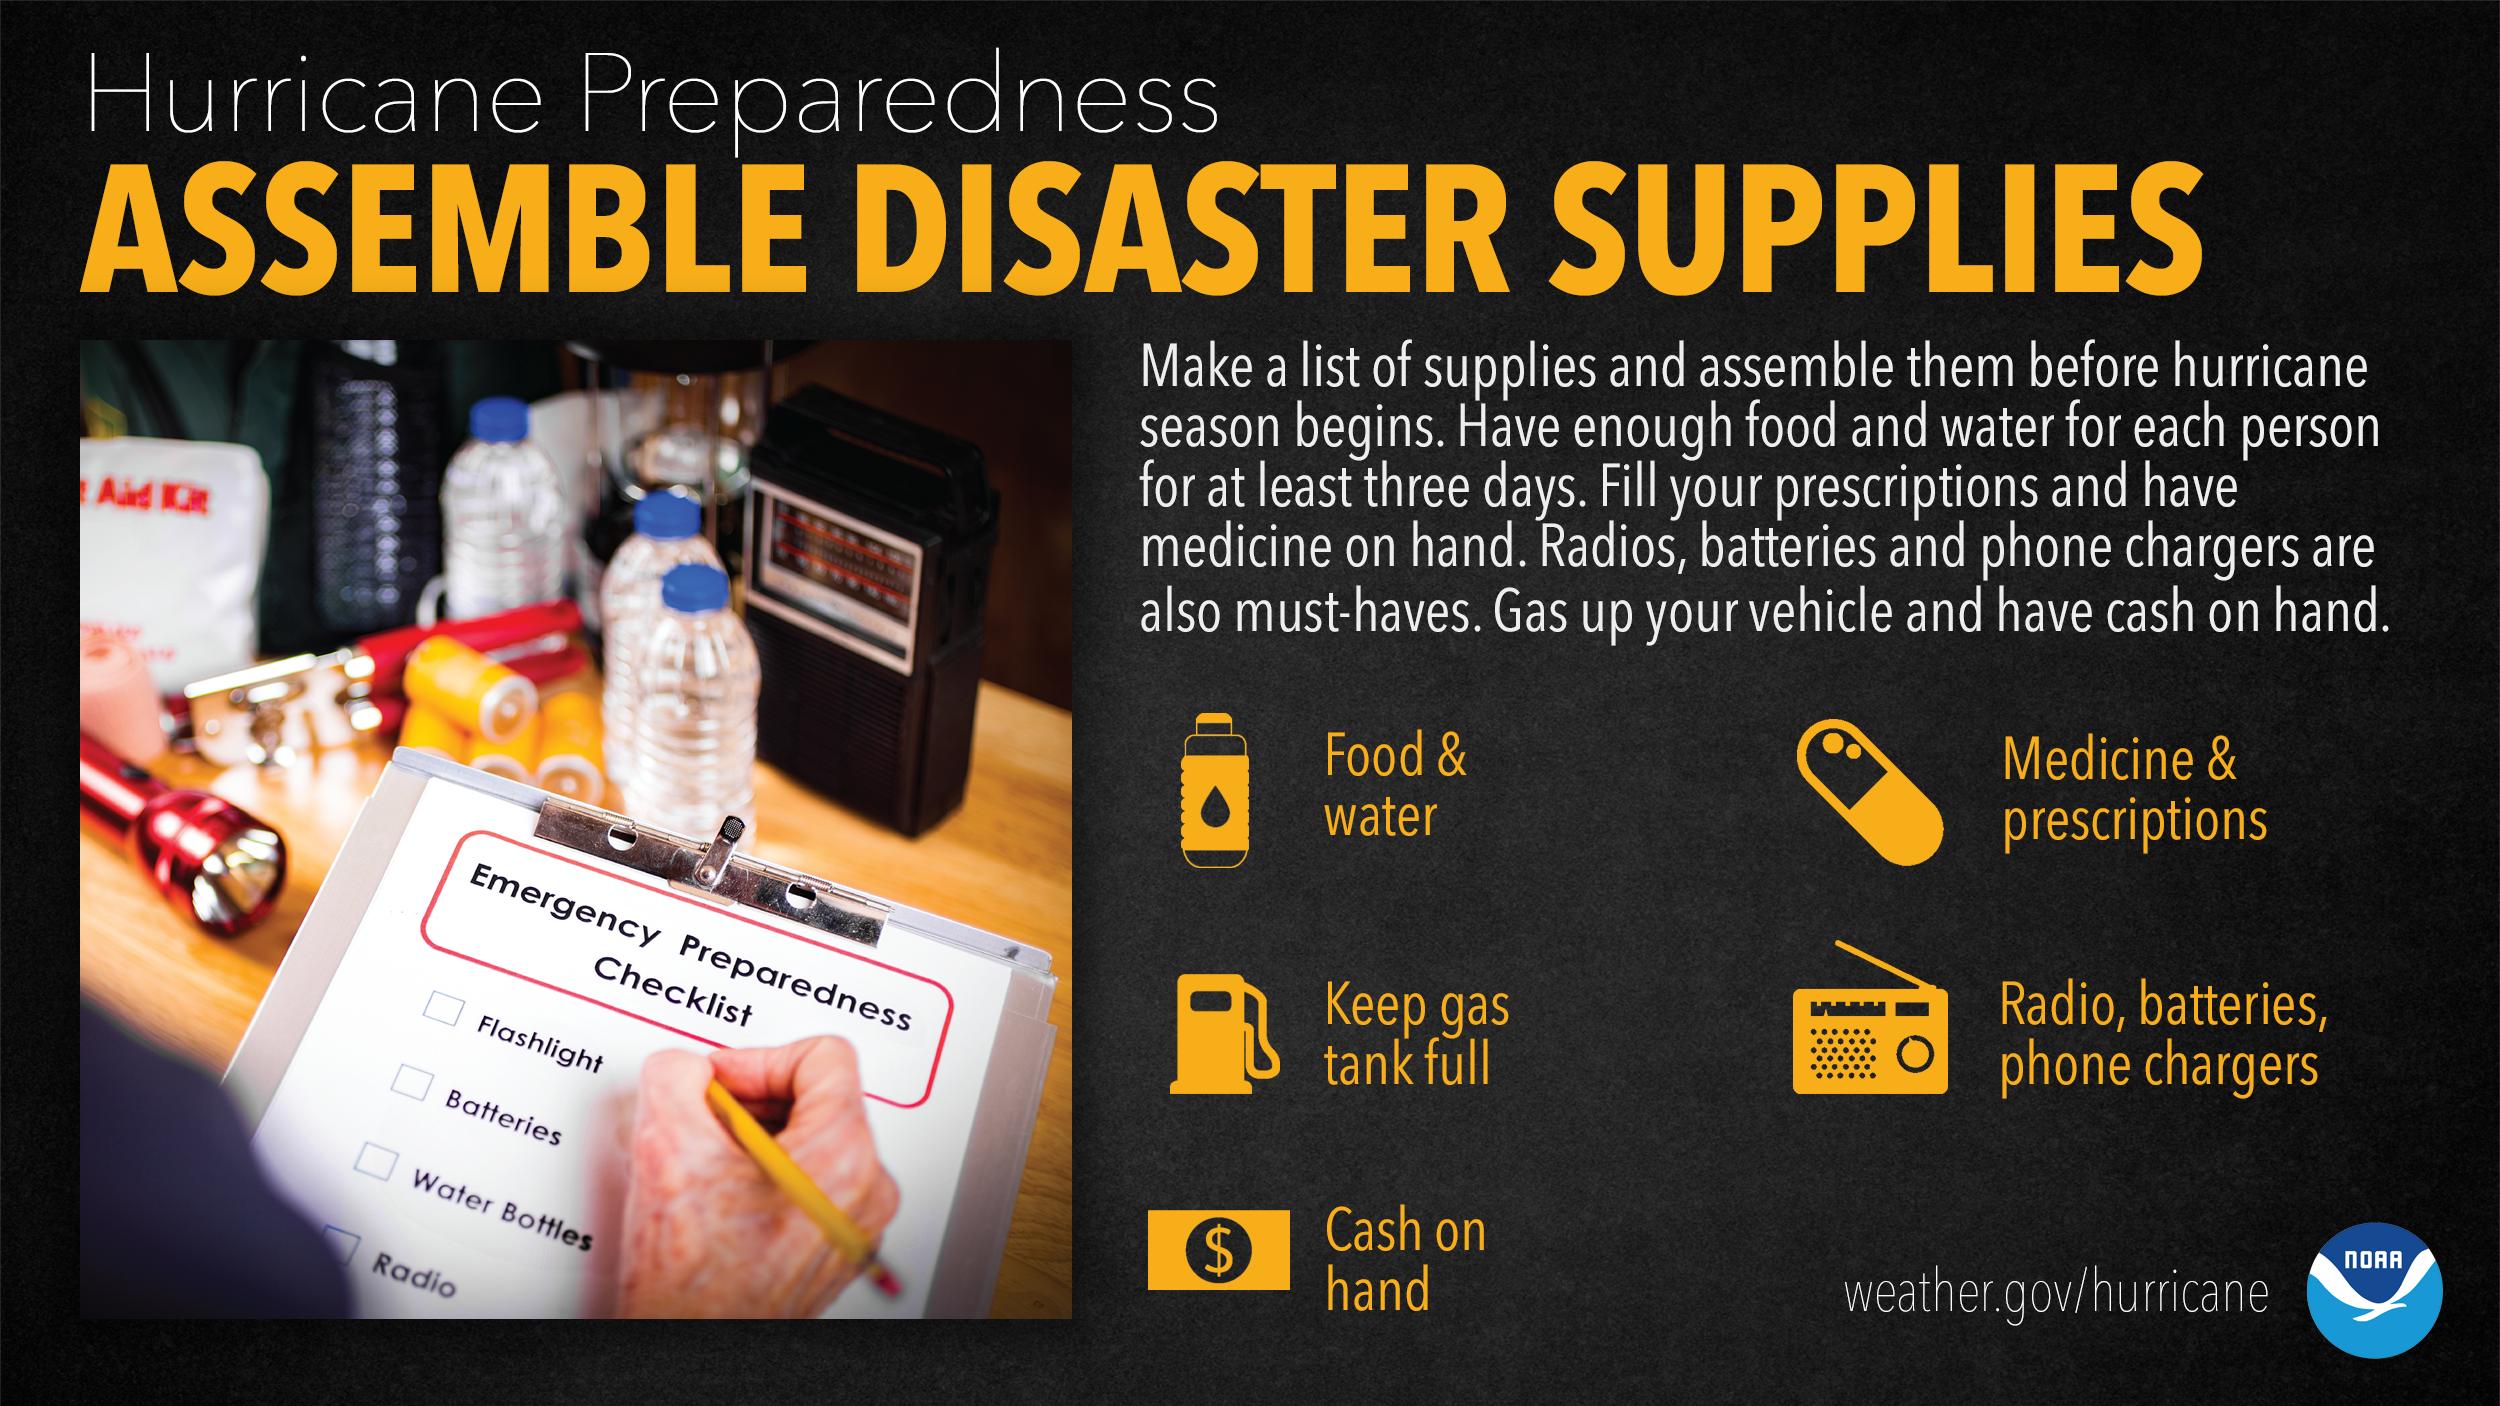 Tips to Be Prepared for Hurricane Season